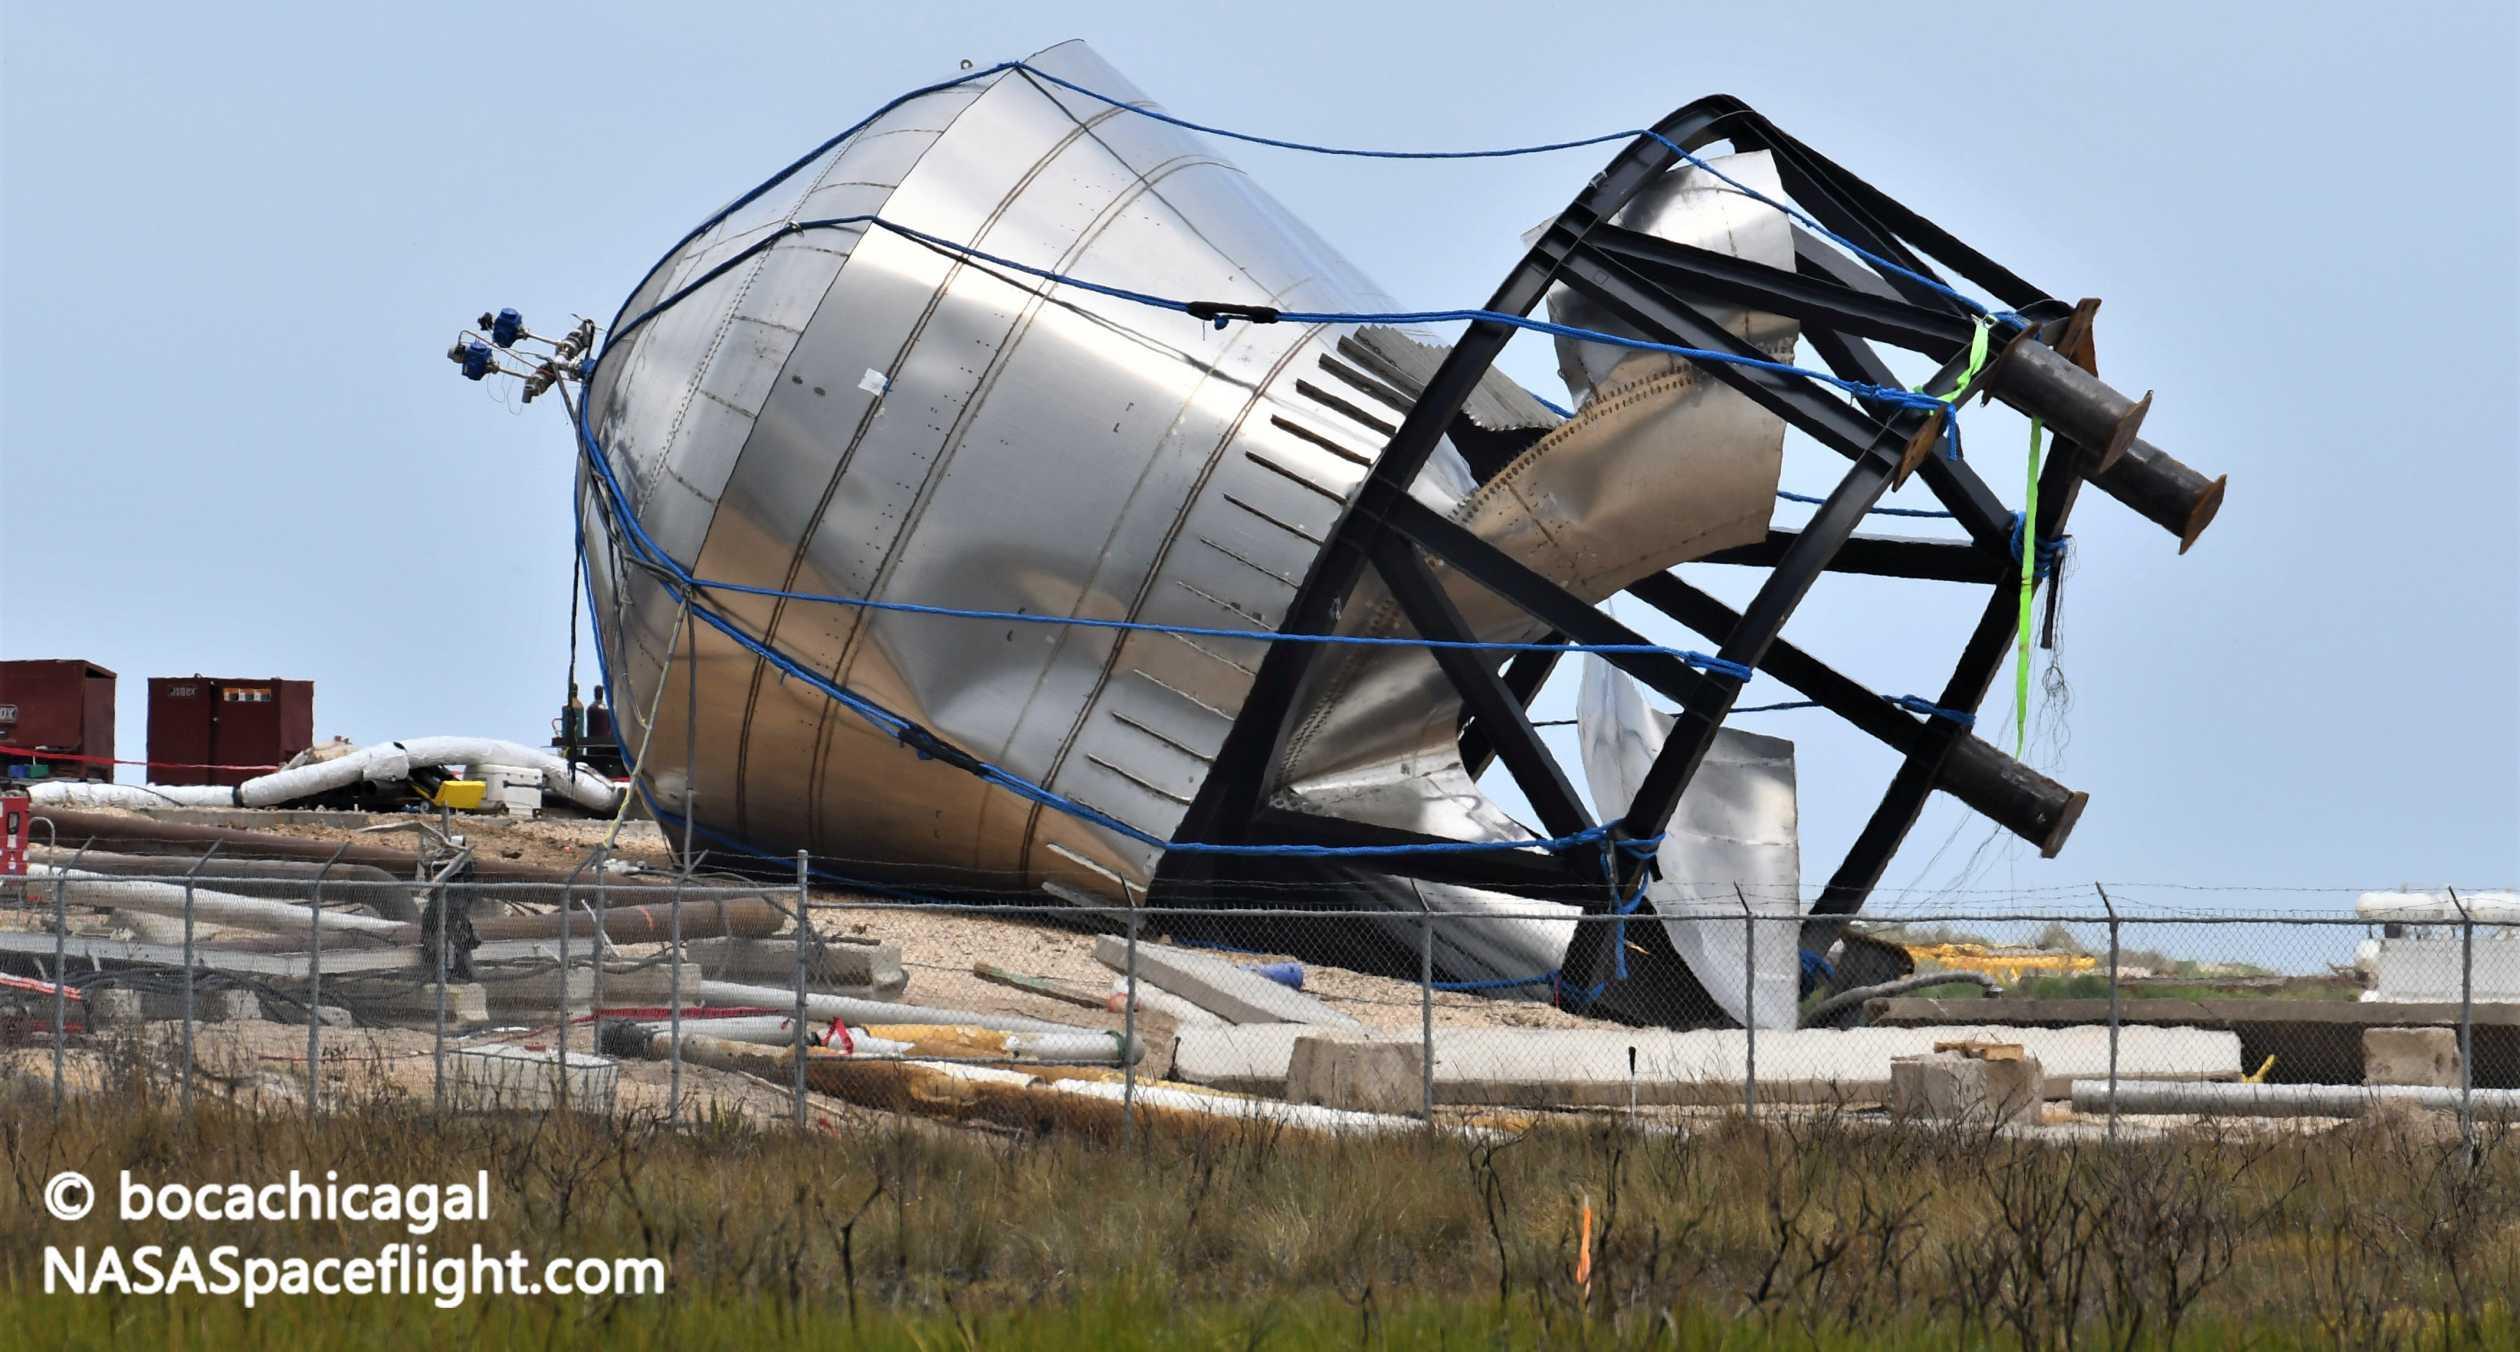 Starship Boca Chica 062320 (NASASpaceflight – bocachicagal) SN7 test tank remains 1 crop (c)